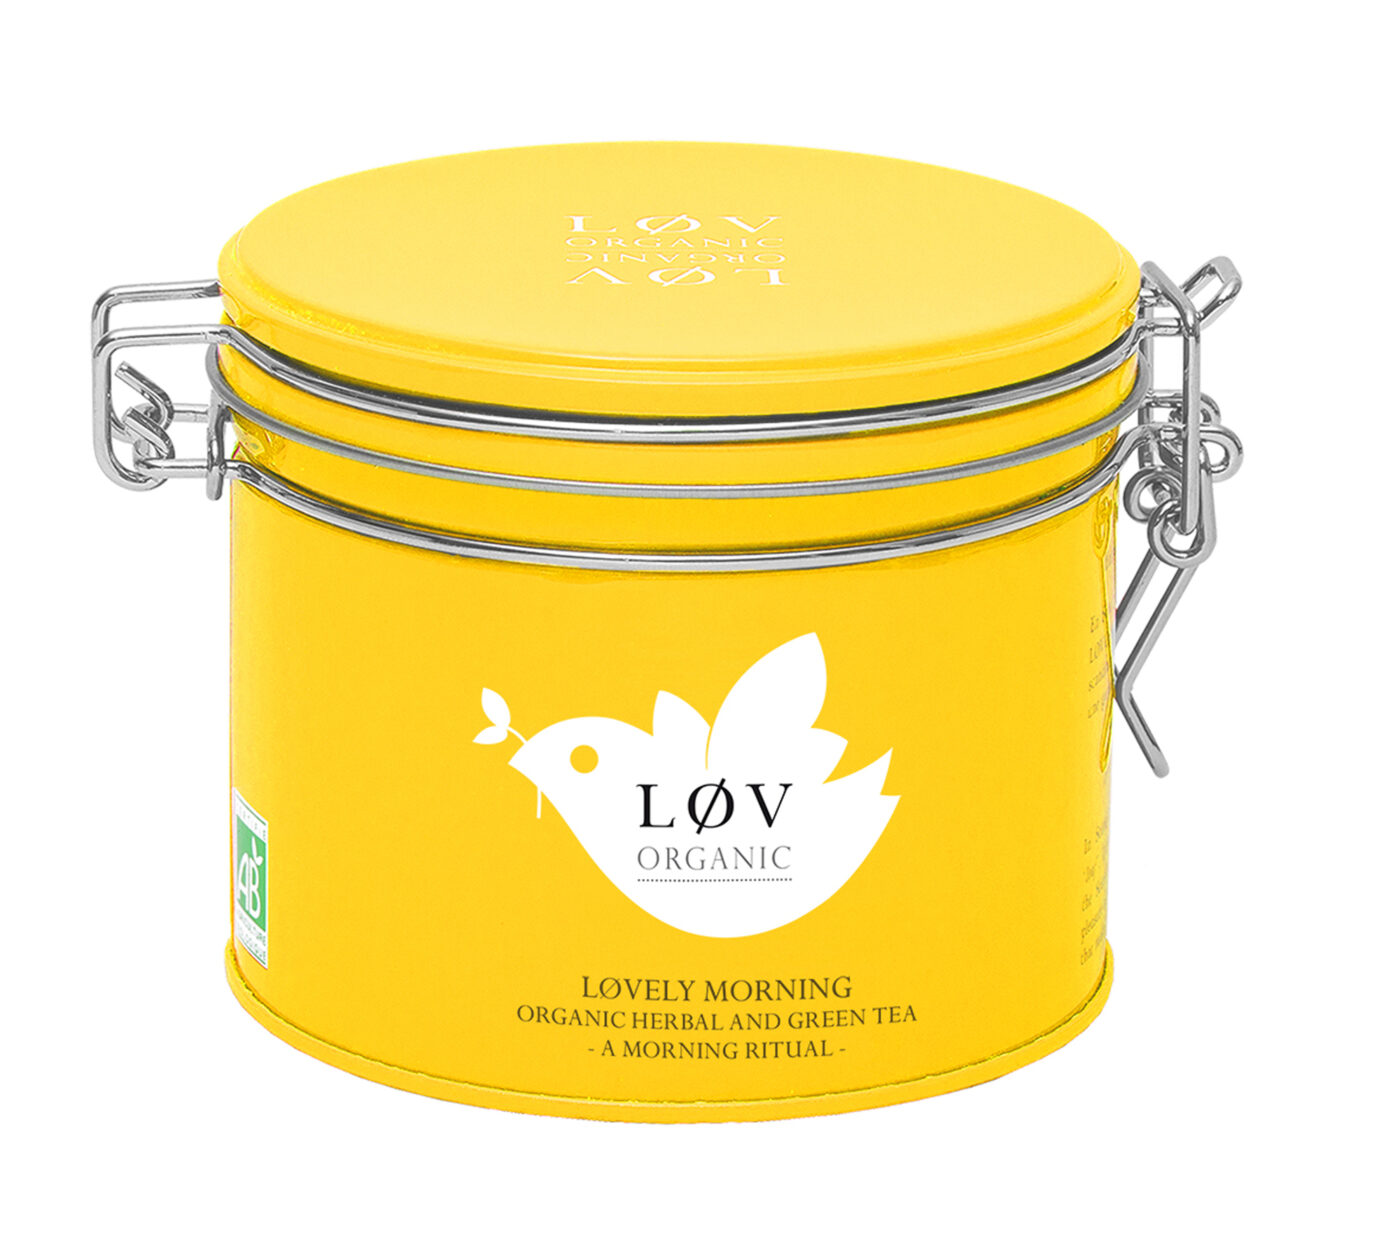 Schönes Geschenk für gute Laune: Organic Tea // HIMBEER